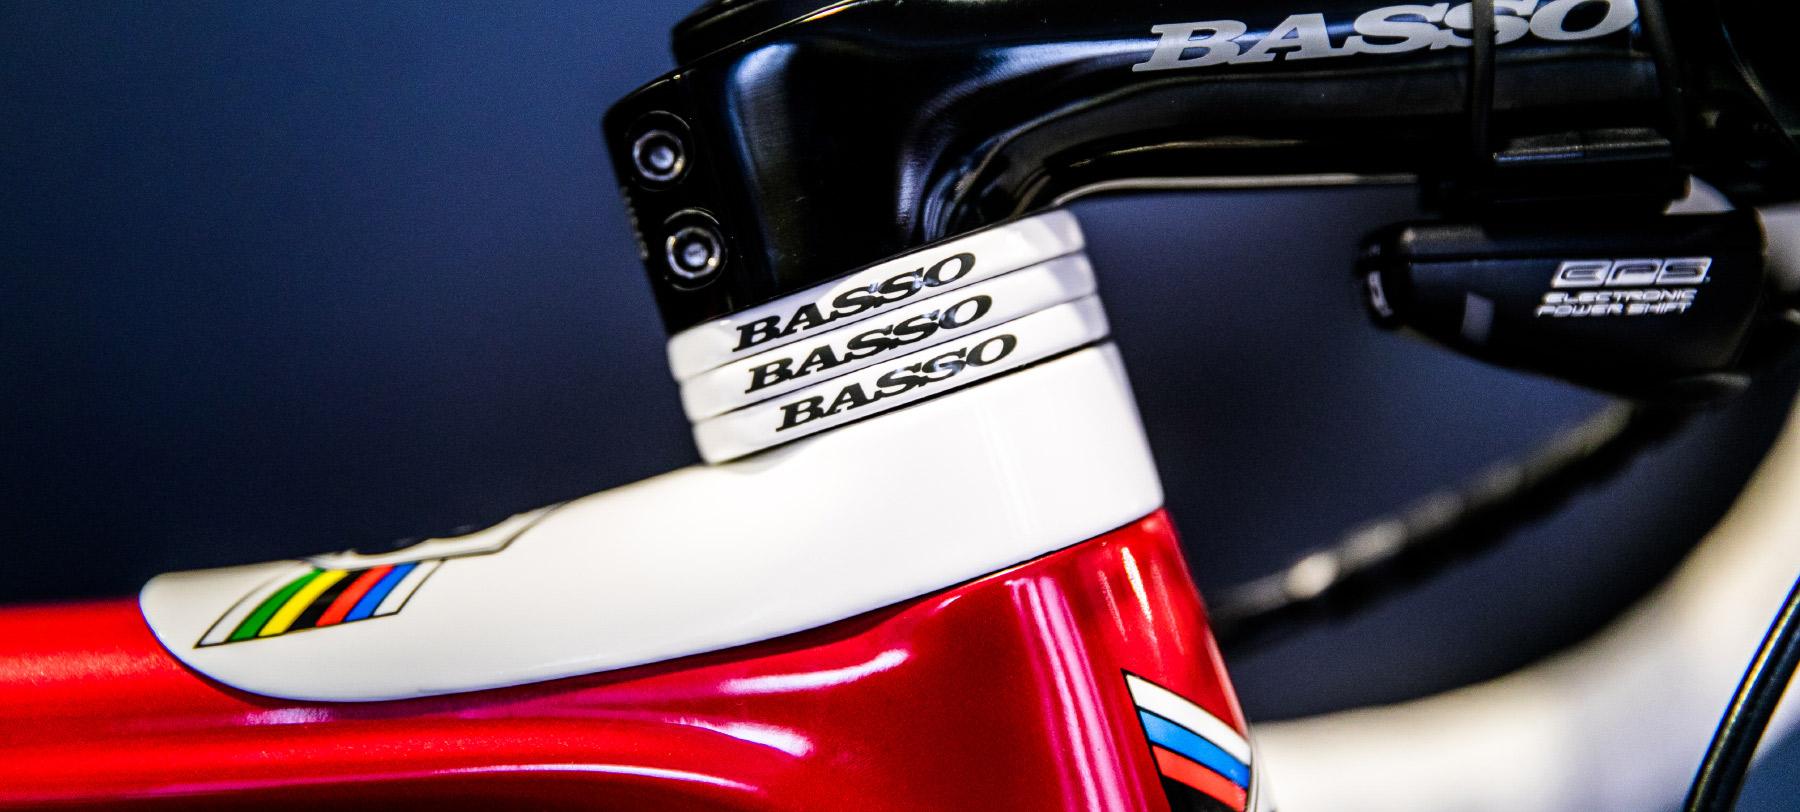 Jos Feron - Basso racefiets